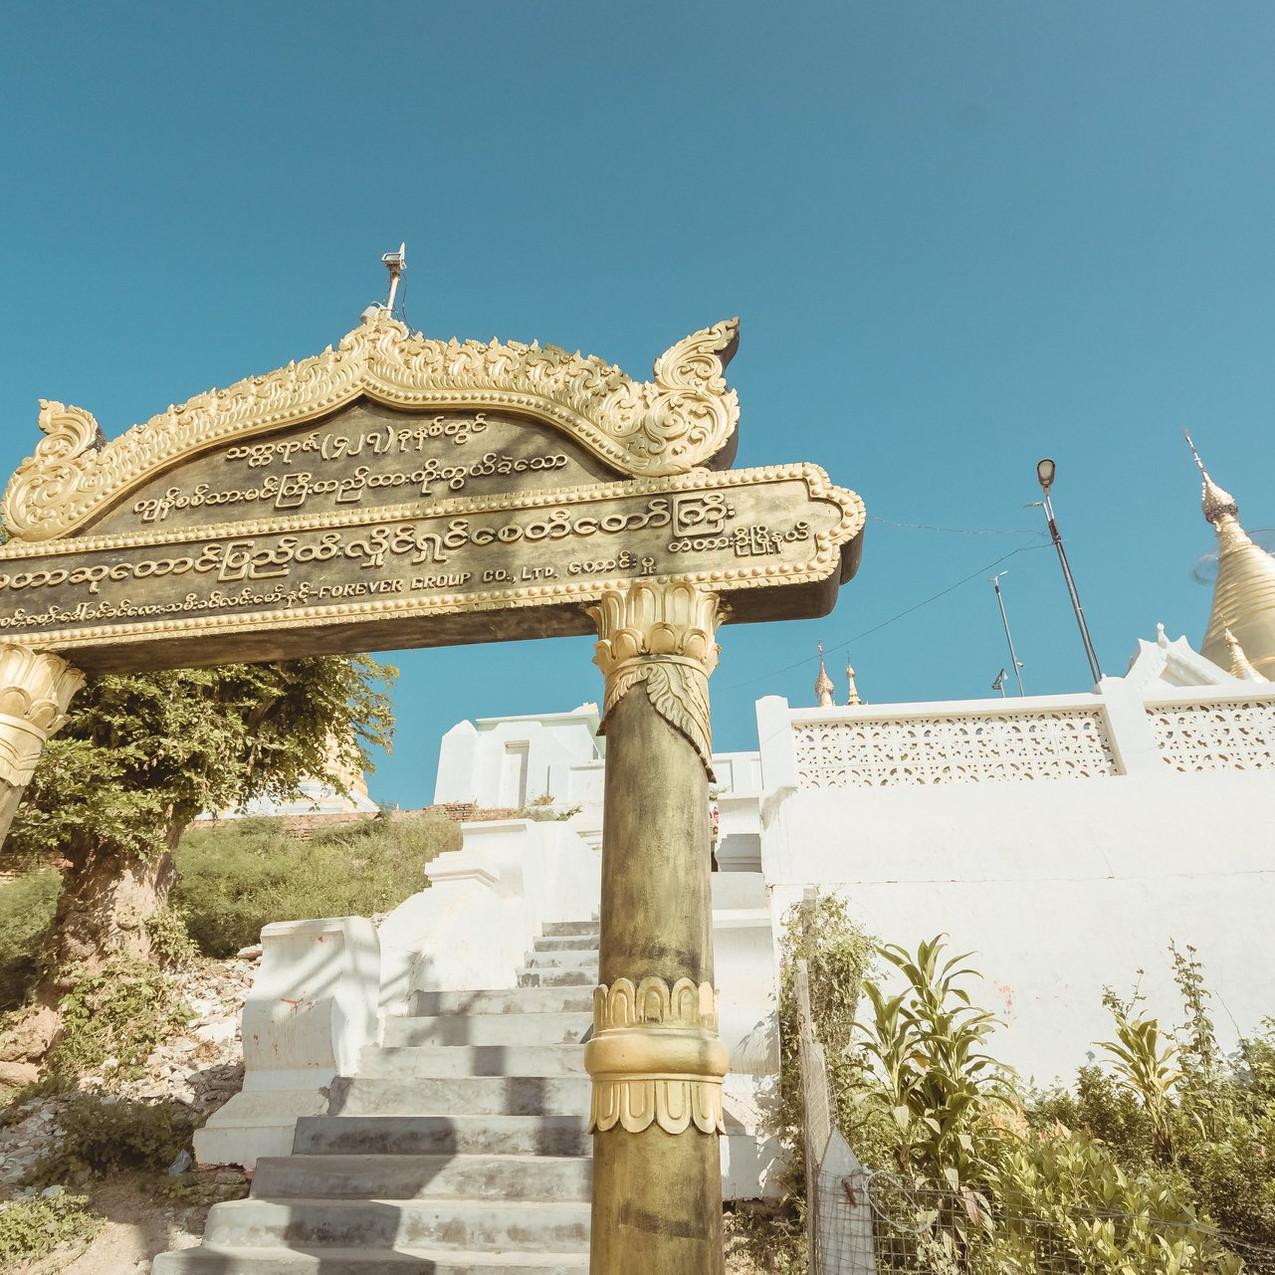 Htee Hlaing Shin Pagoda